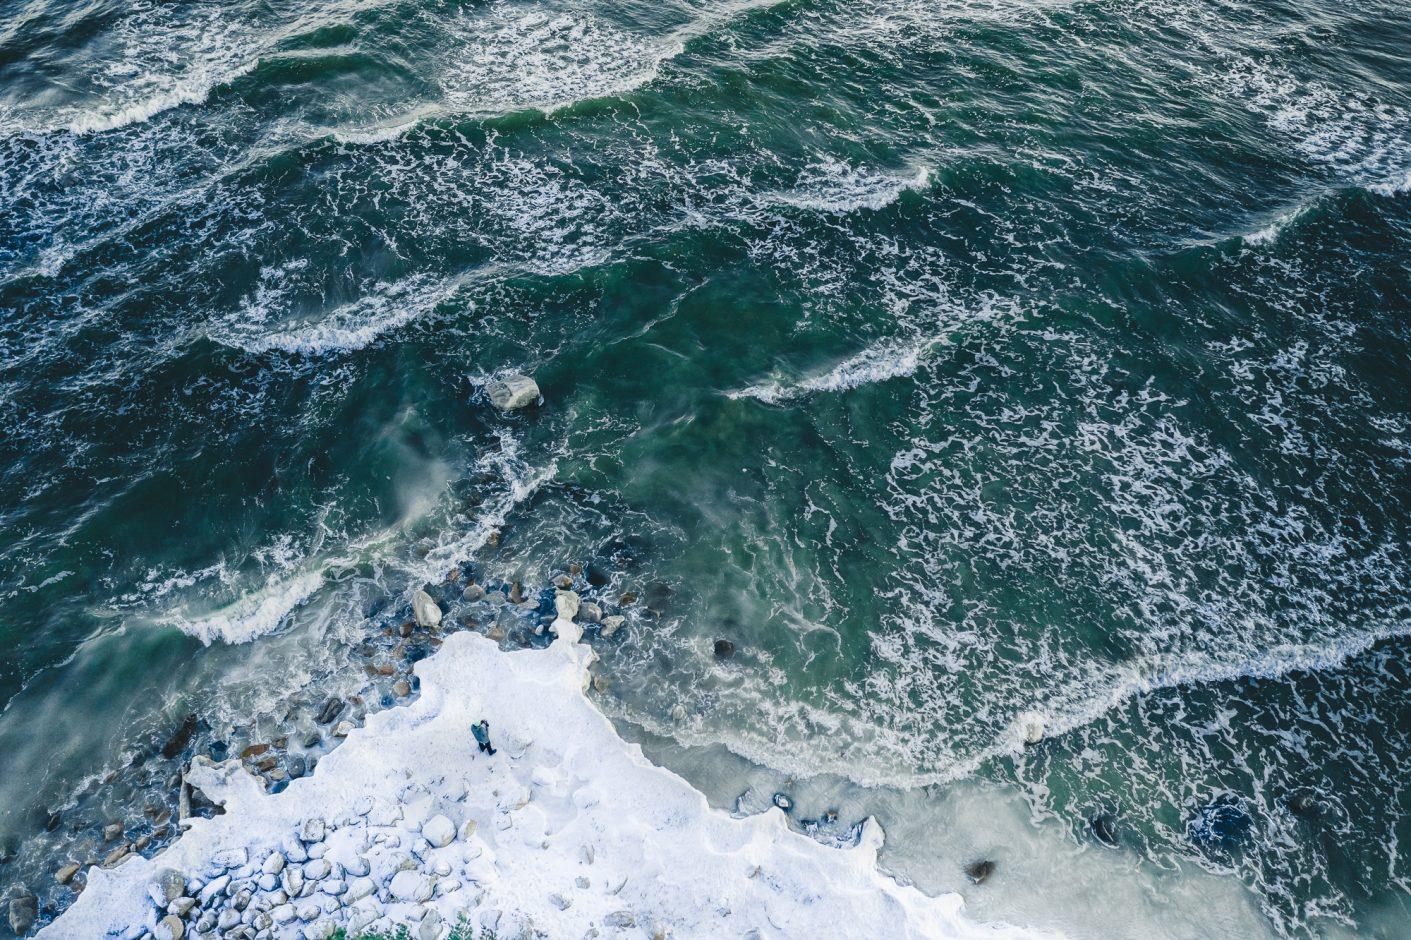 aerial view, aerial photography, jurgis kreilis, filmday